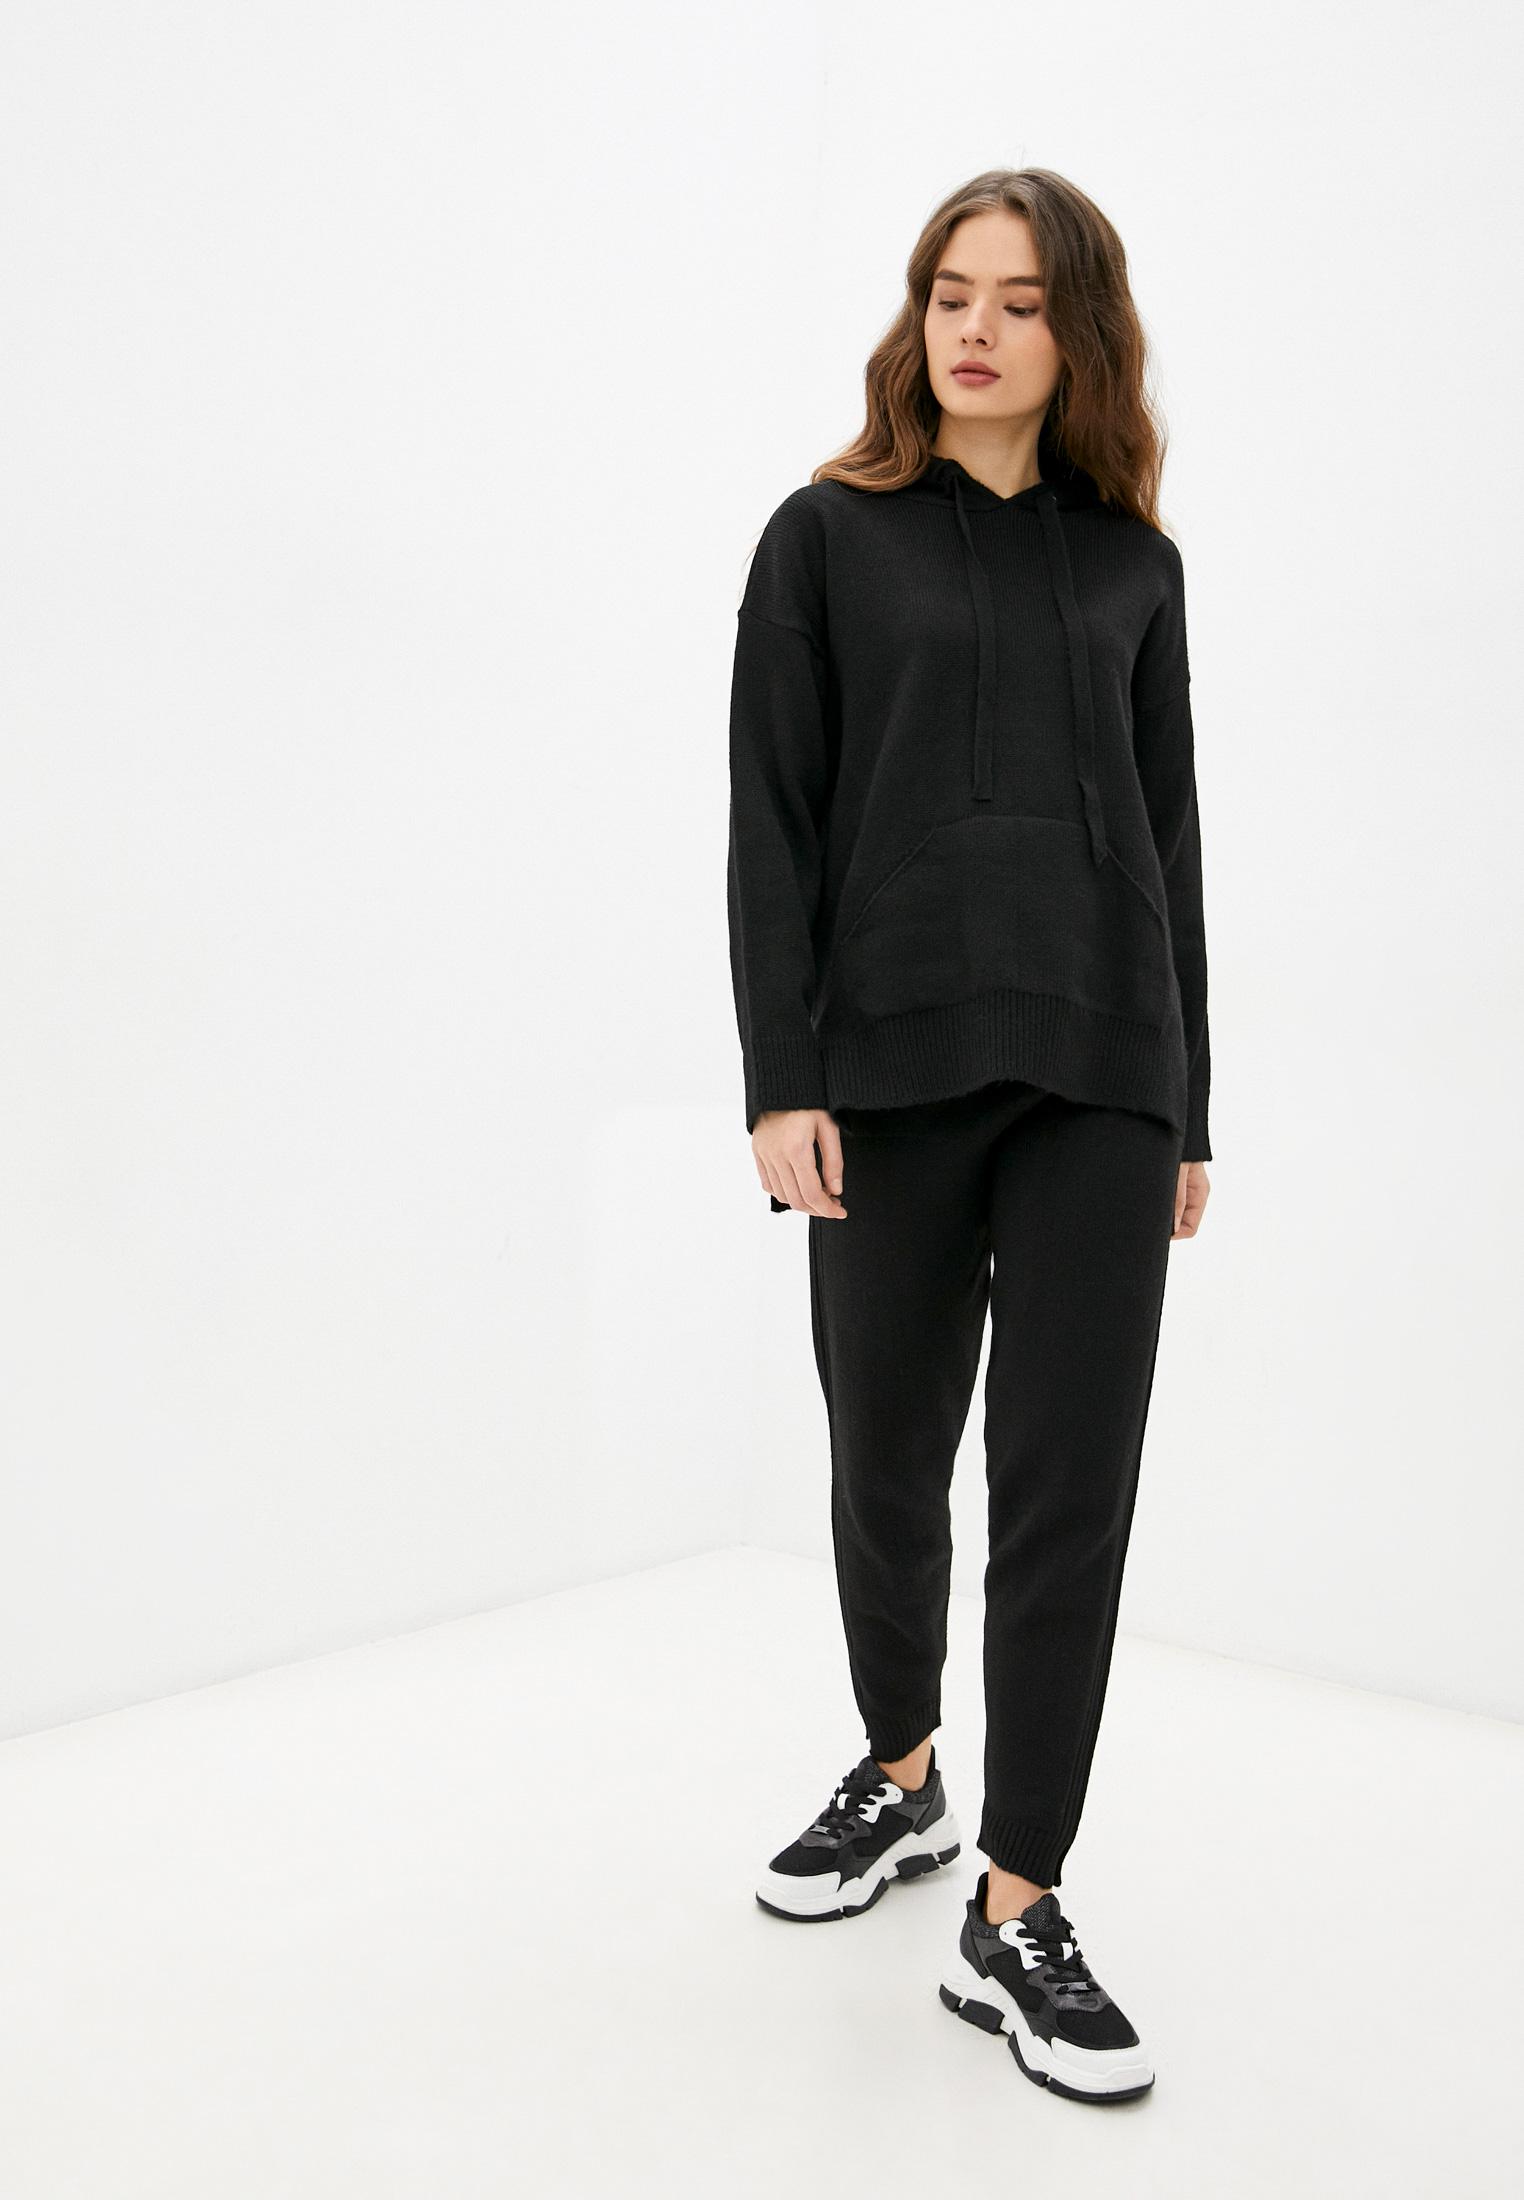 Костюм с брюками Moona Store fw21029